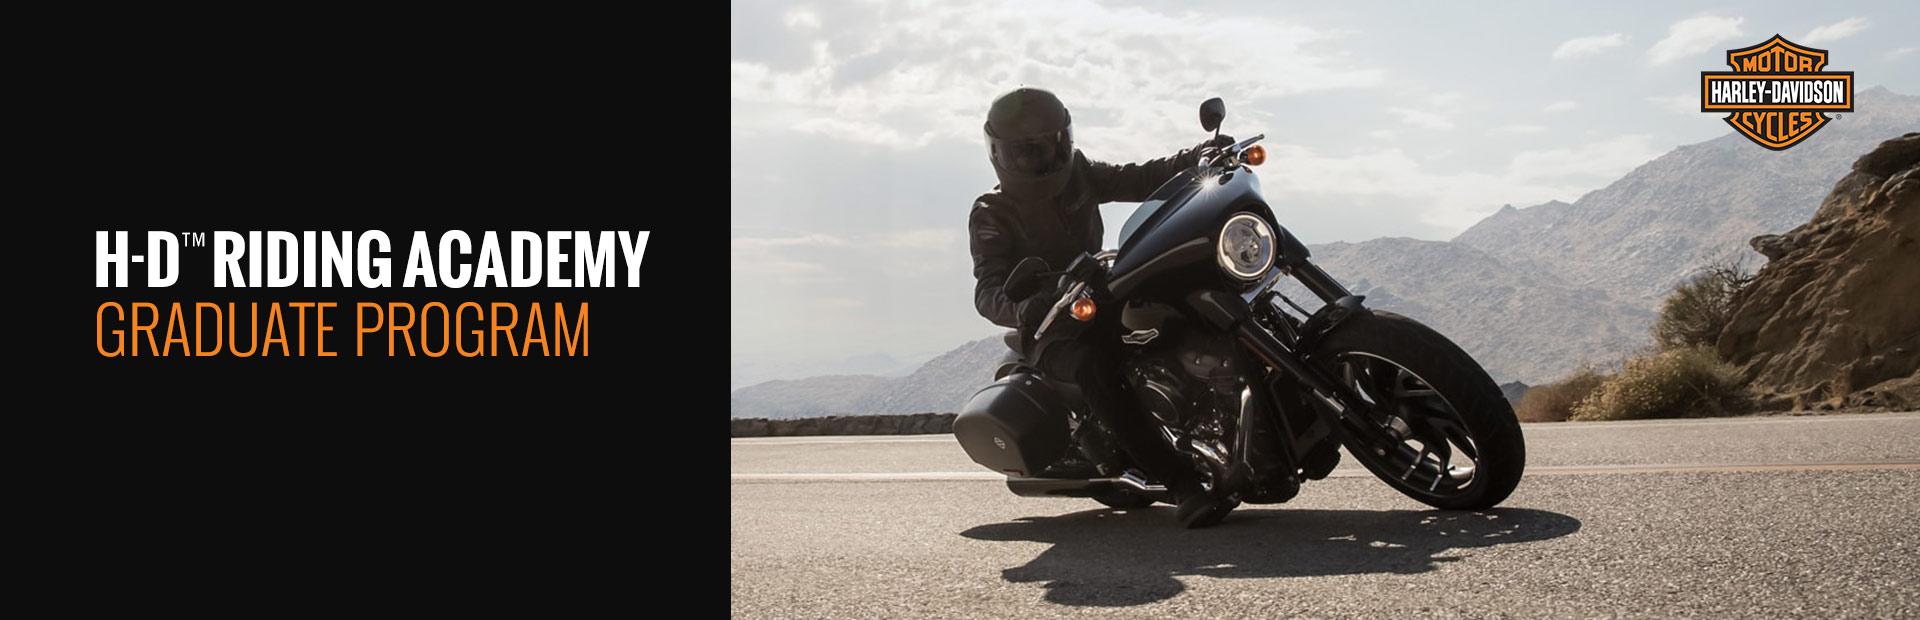 Harley Davidson H D Riding Academy Graduate Program Low Country